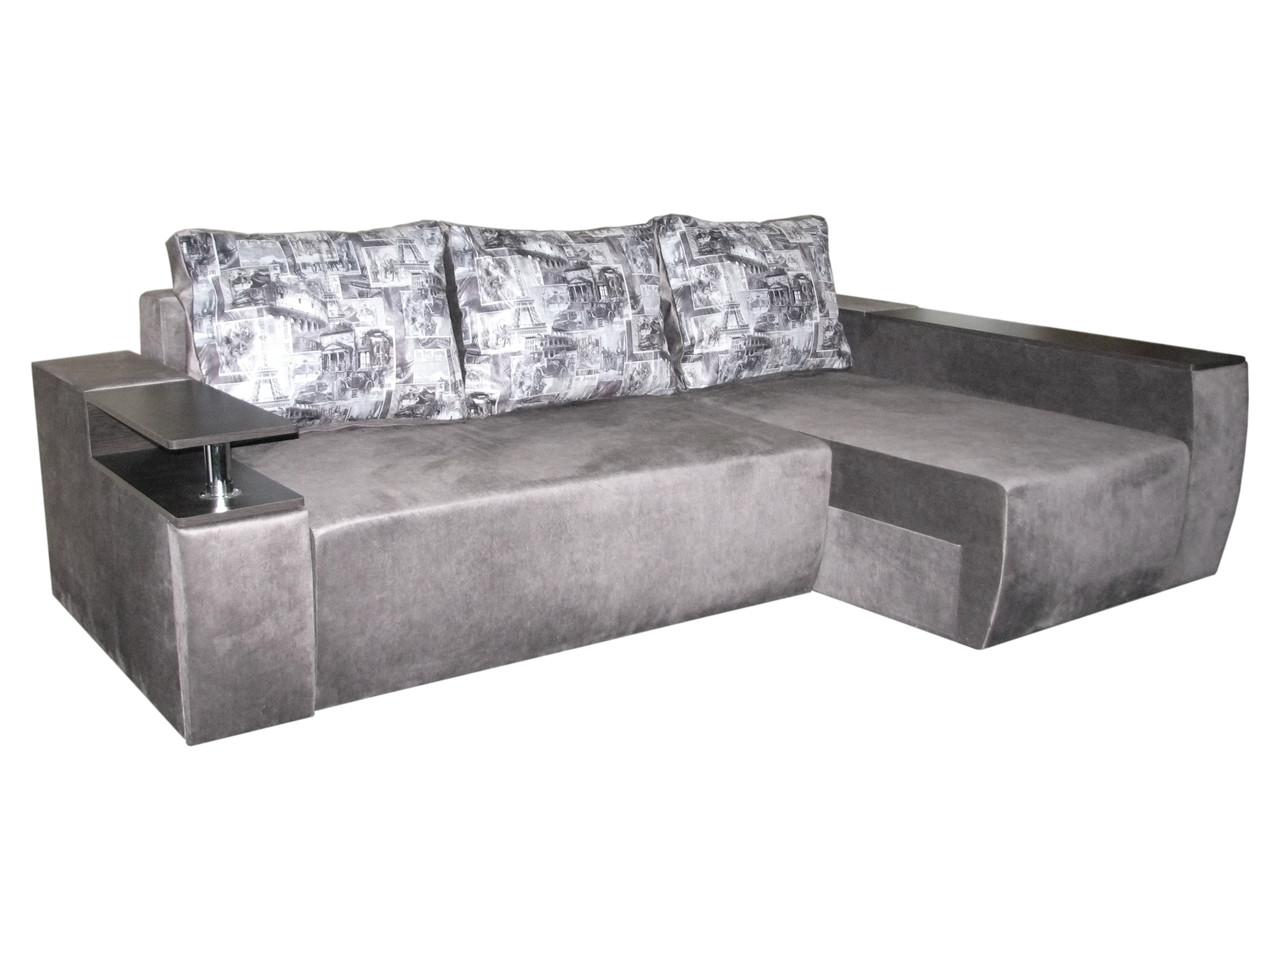 Угловой диван на пружинном блоке Мустанг